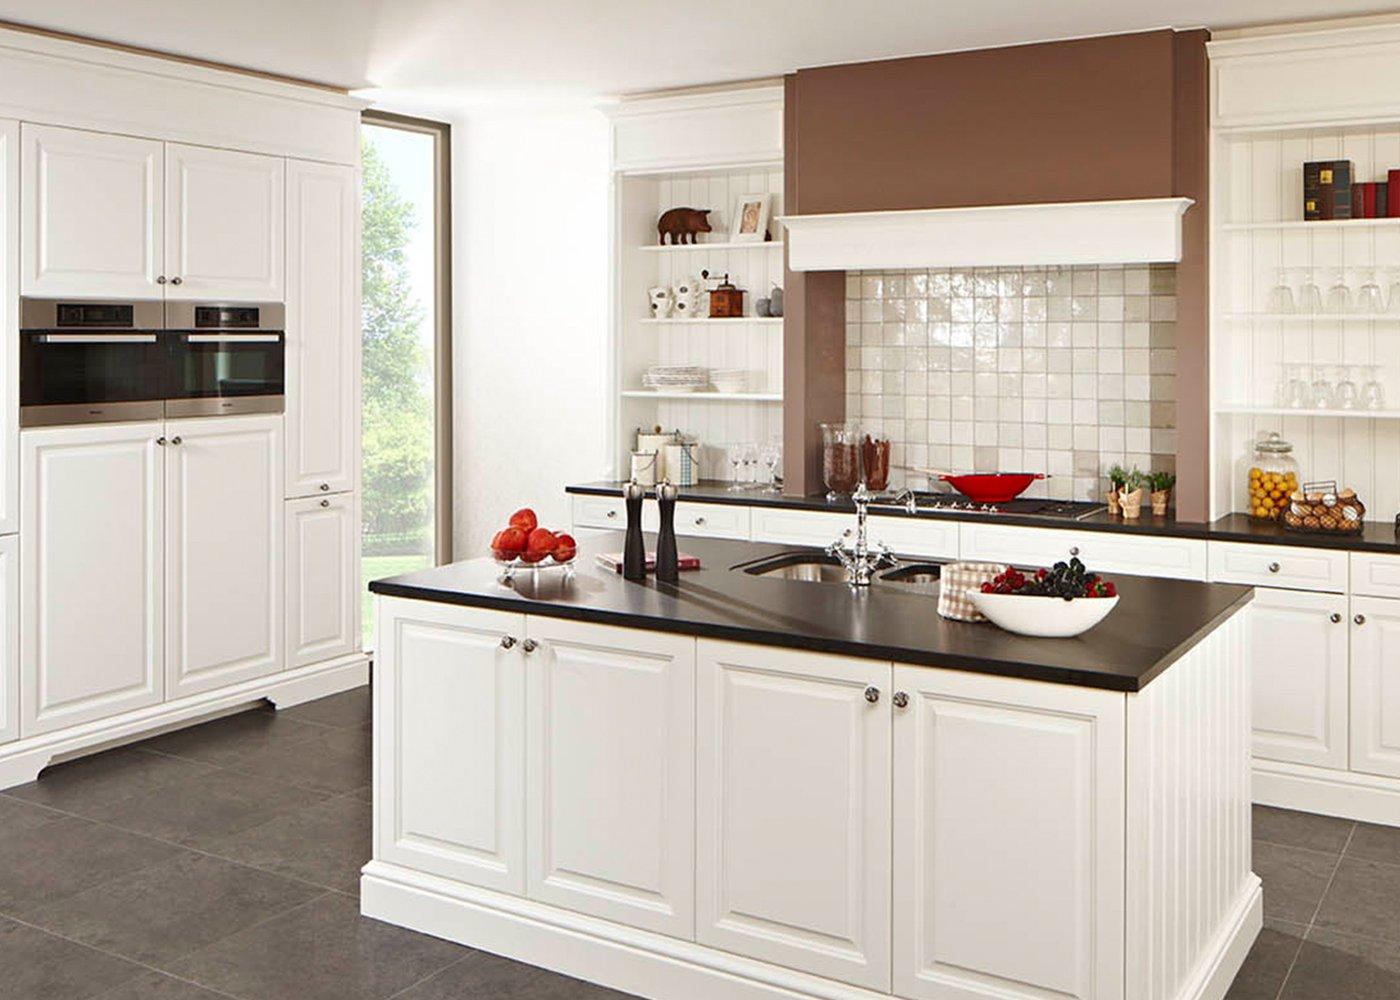 Witte geborstelde eiken keuken - Model Cottage